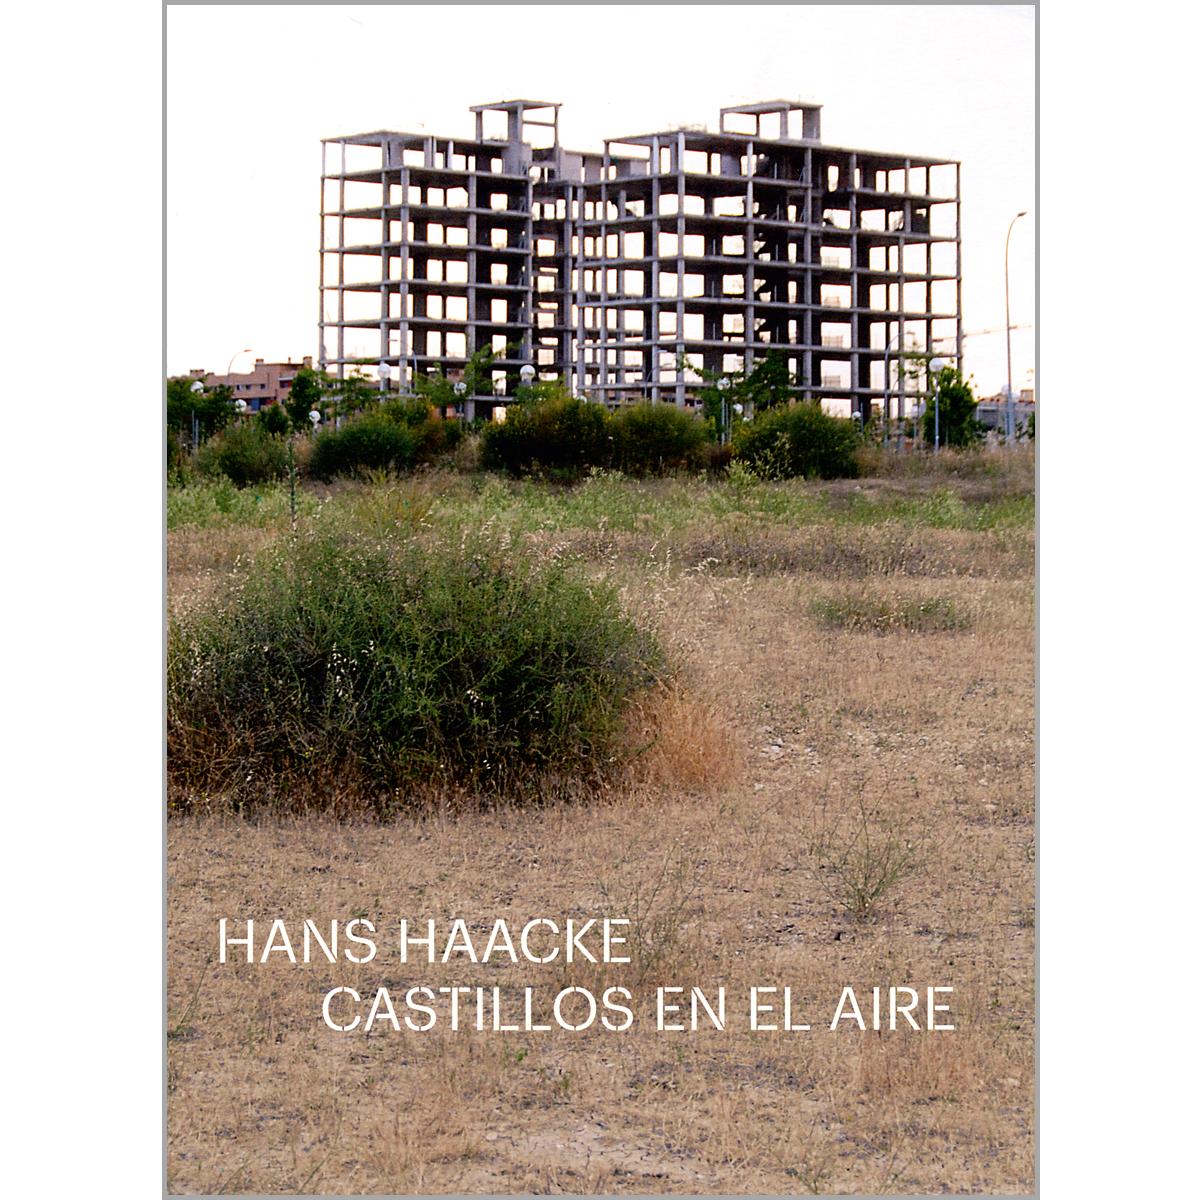 Hans Haake